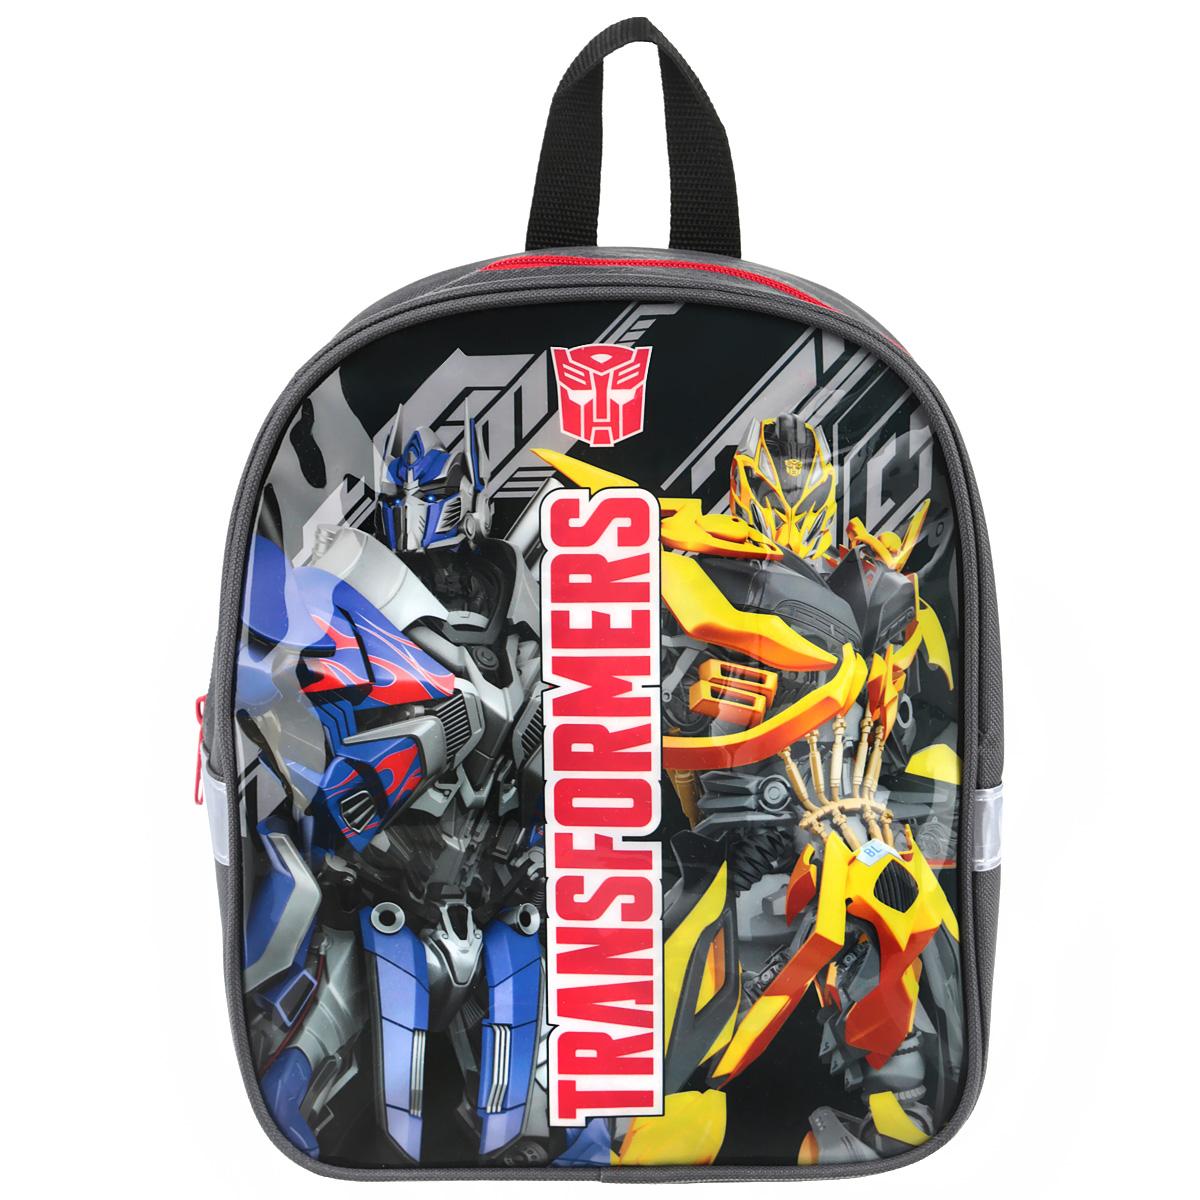 Рюкзак детский  Transformers Prime , цвет: серый -  Ранцы и рюкзаки